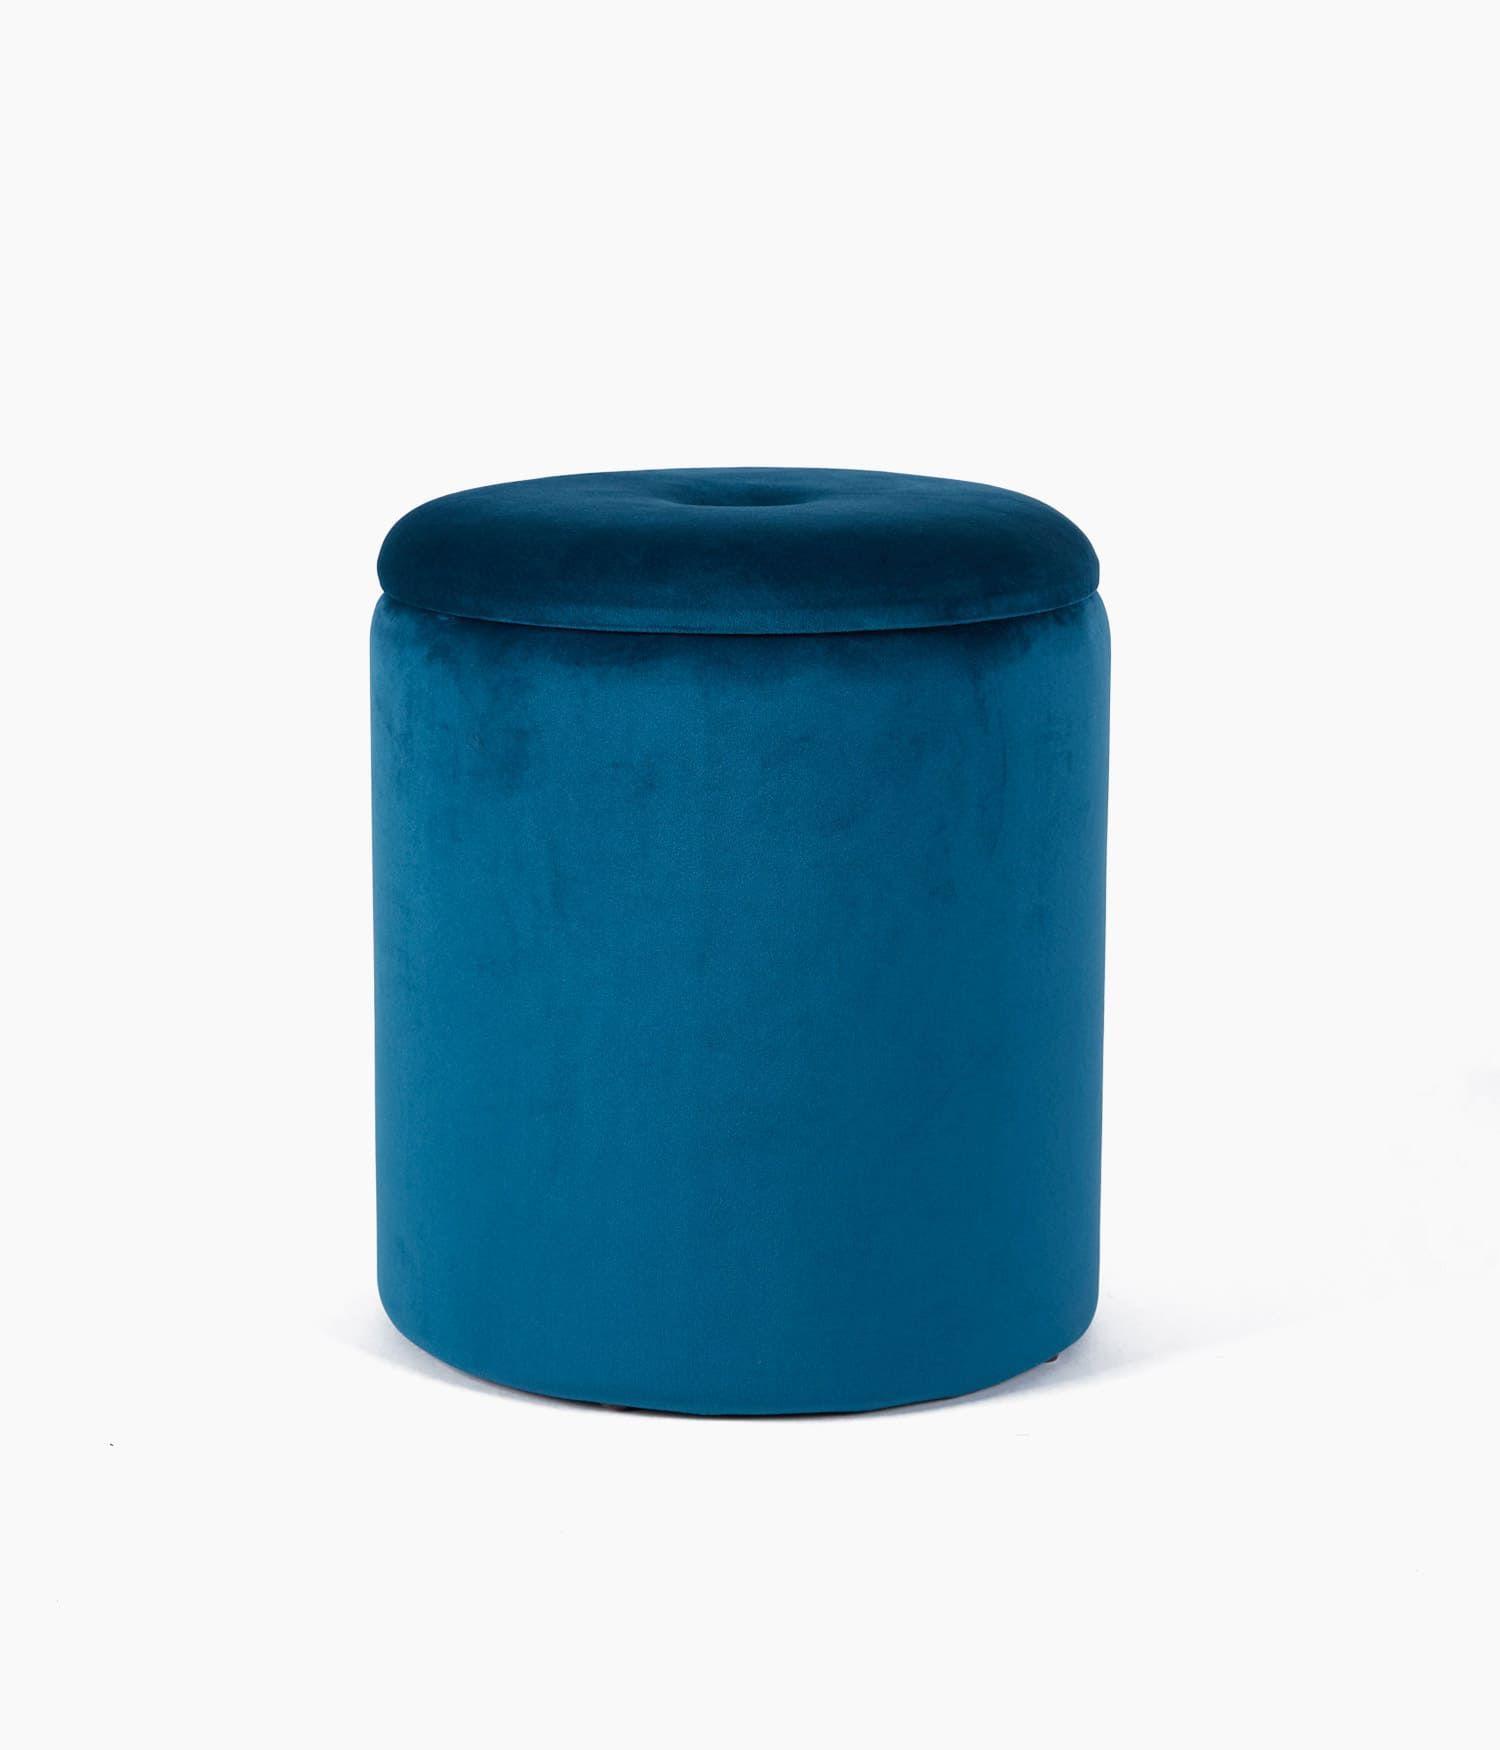 tabouret coffre gm35,5*45/pm31.5*38 bleu canard